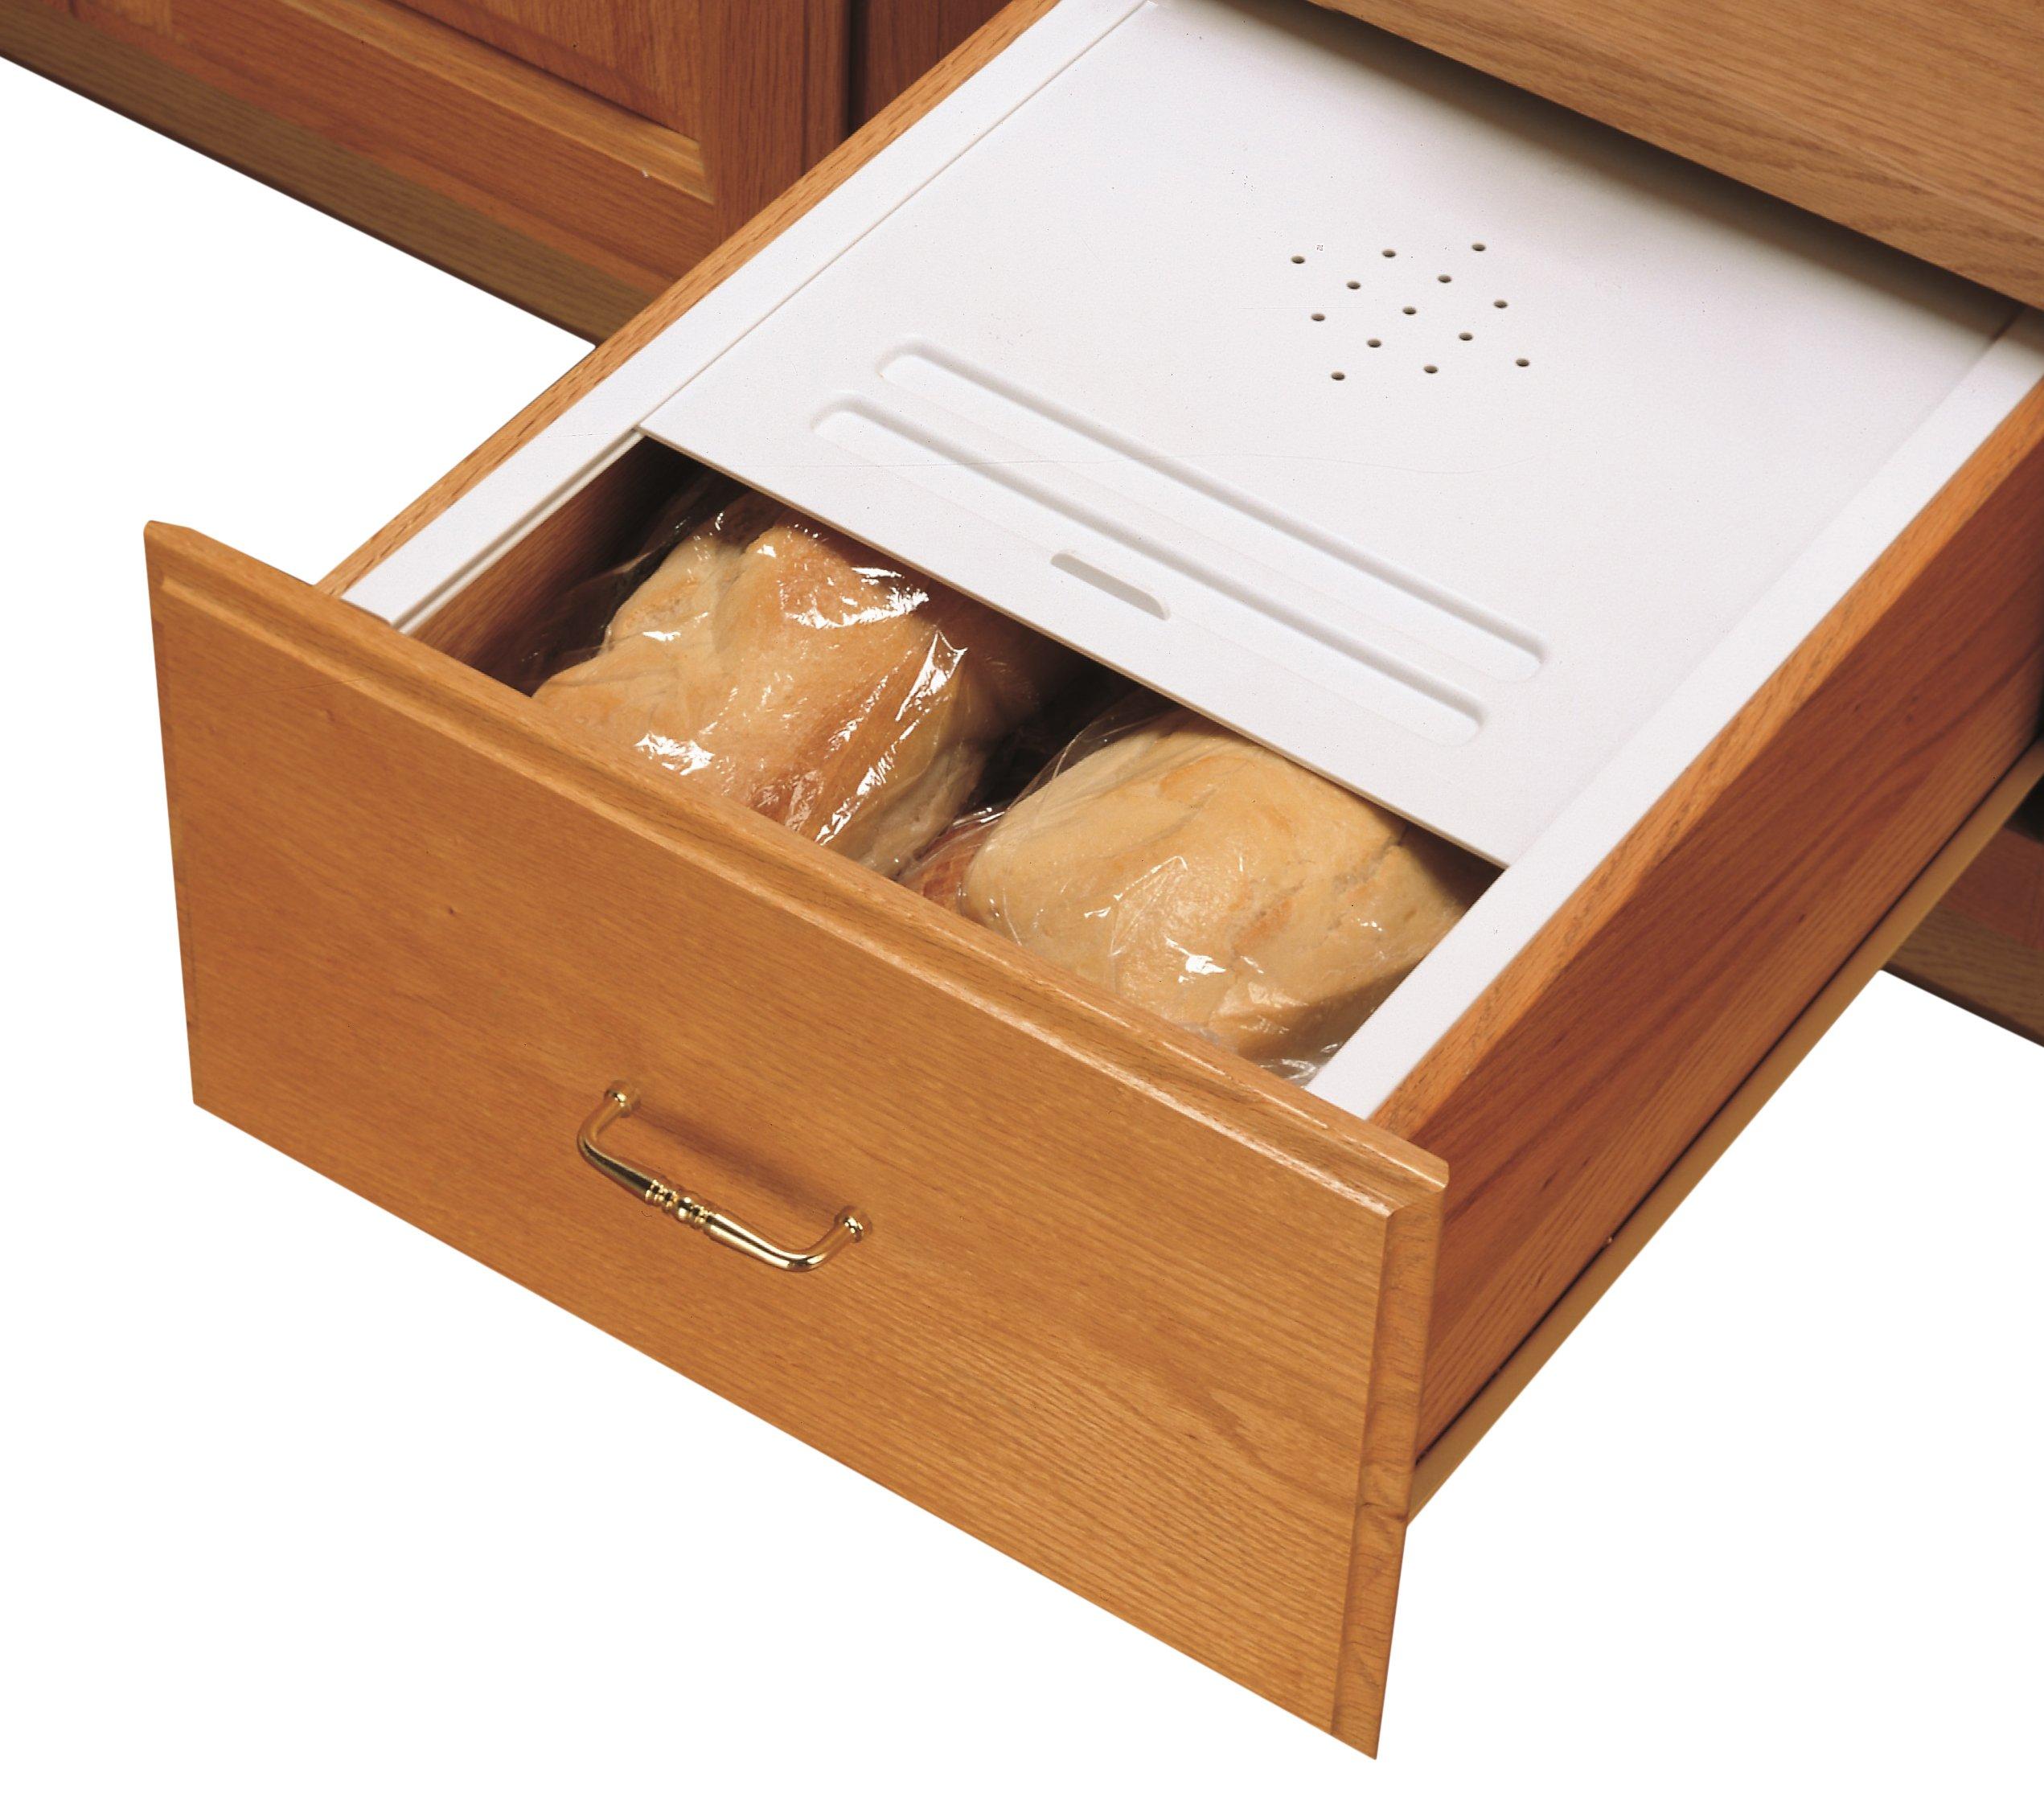 Rev-A-Shelf Small Bread Cover Kit Drawer Organizers, White